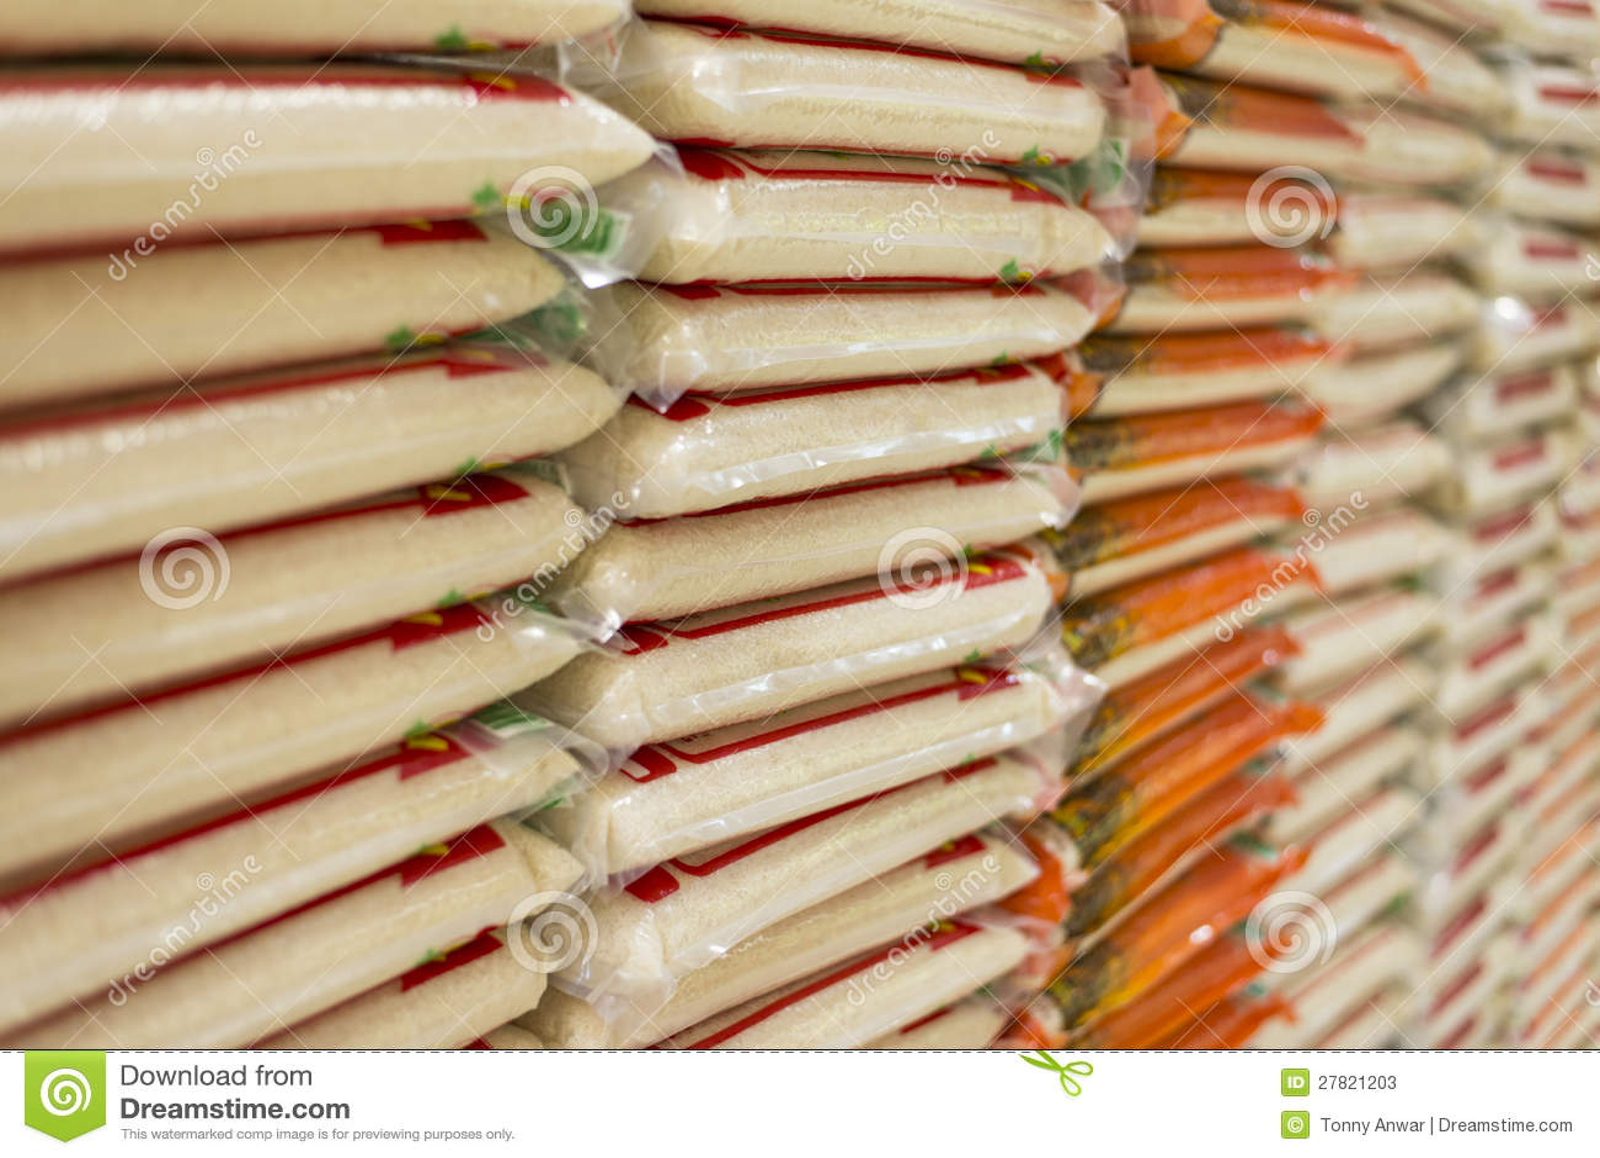 Stapel Reis